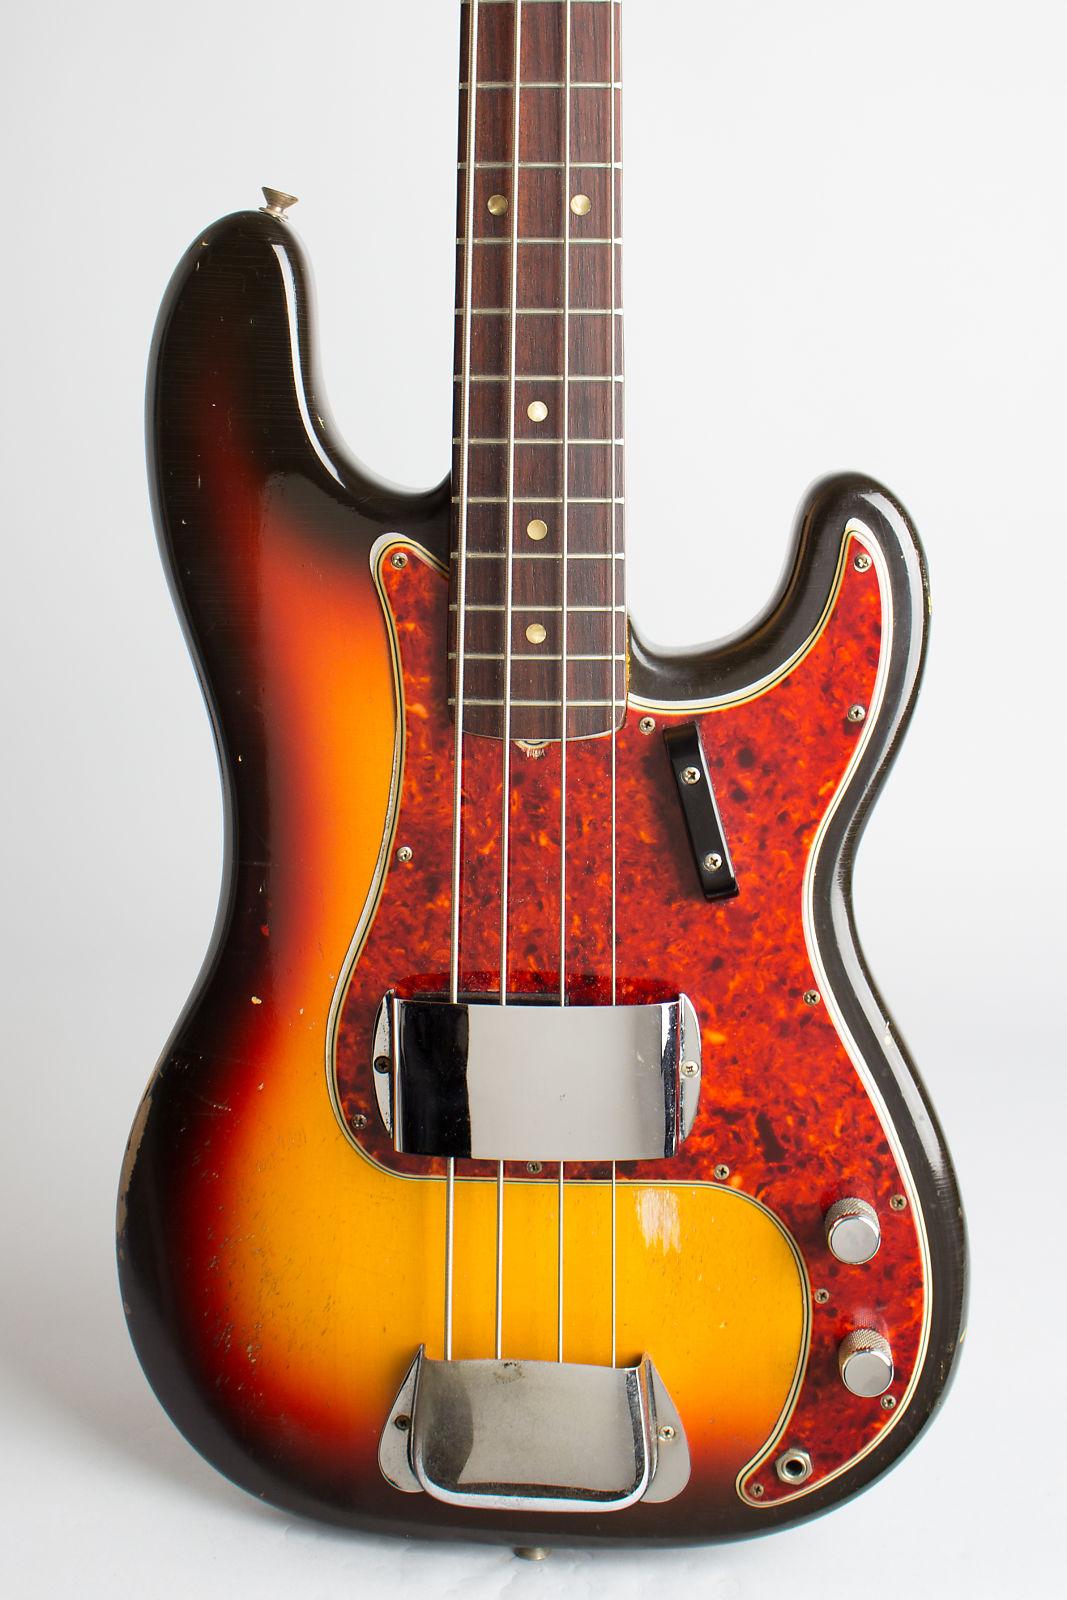 Fender  Precision Bass Solid Body Electric Bass Guitar (1966), ser. #141012, original black tolex hard shell case.